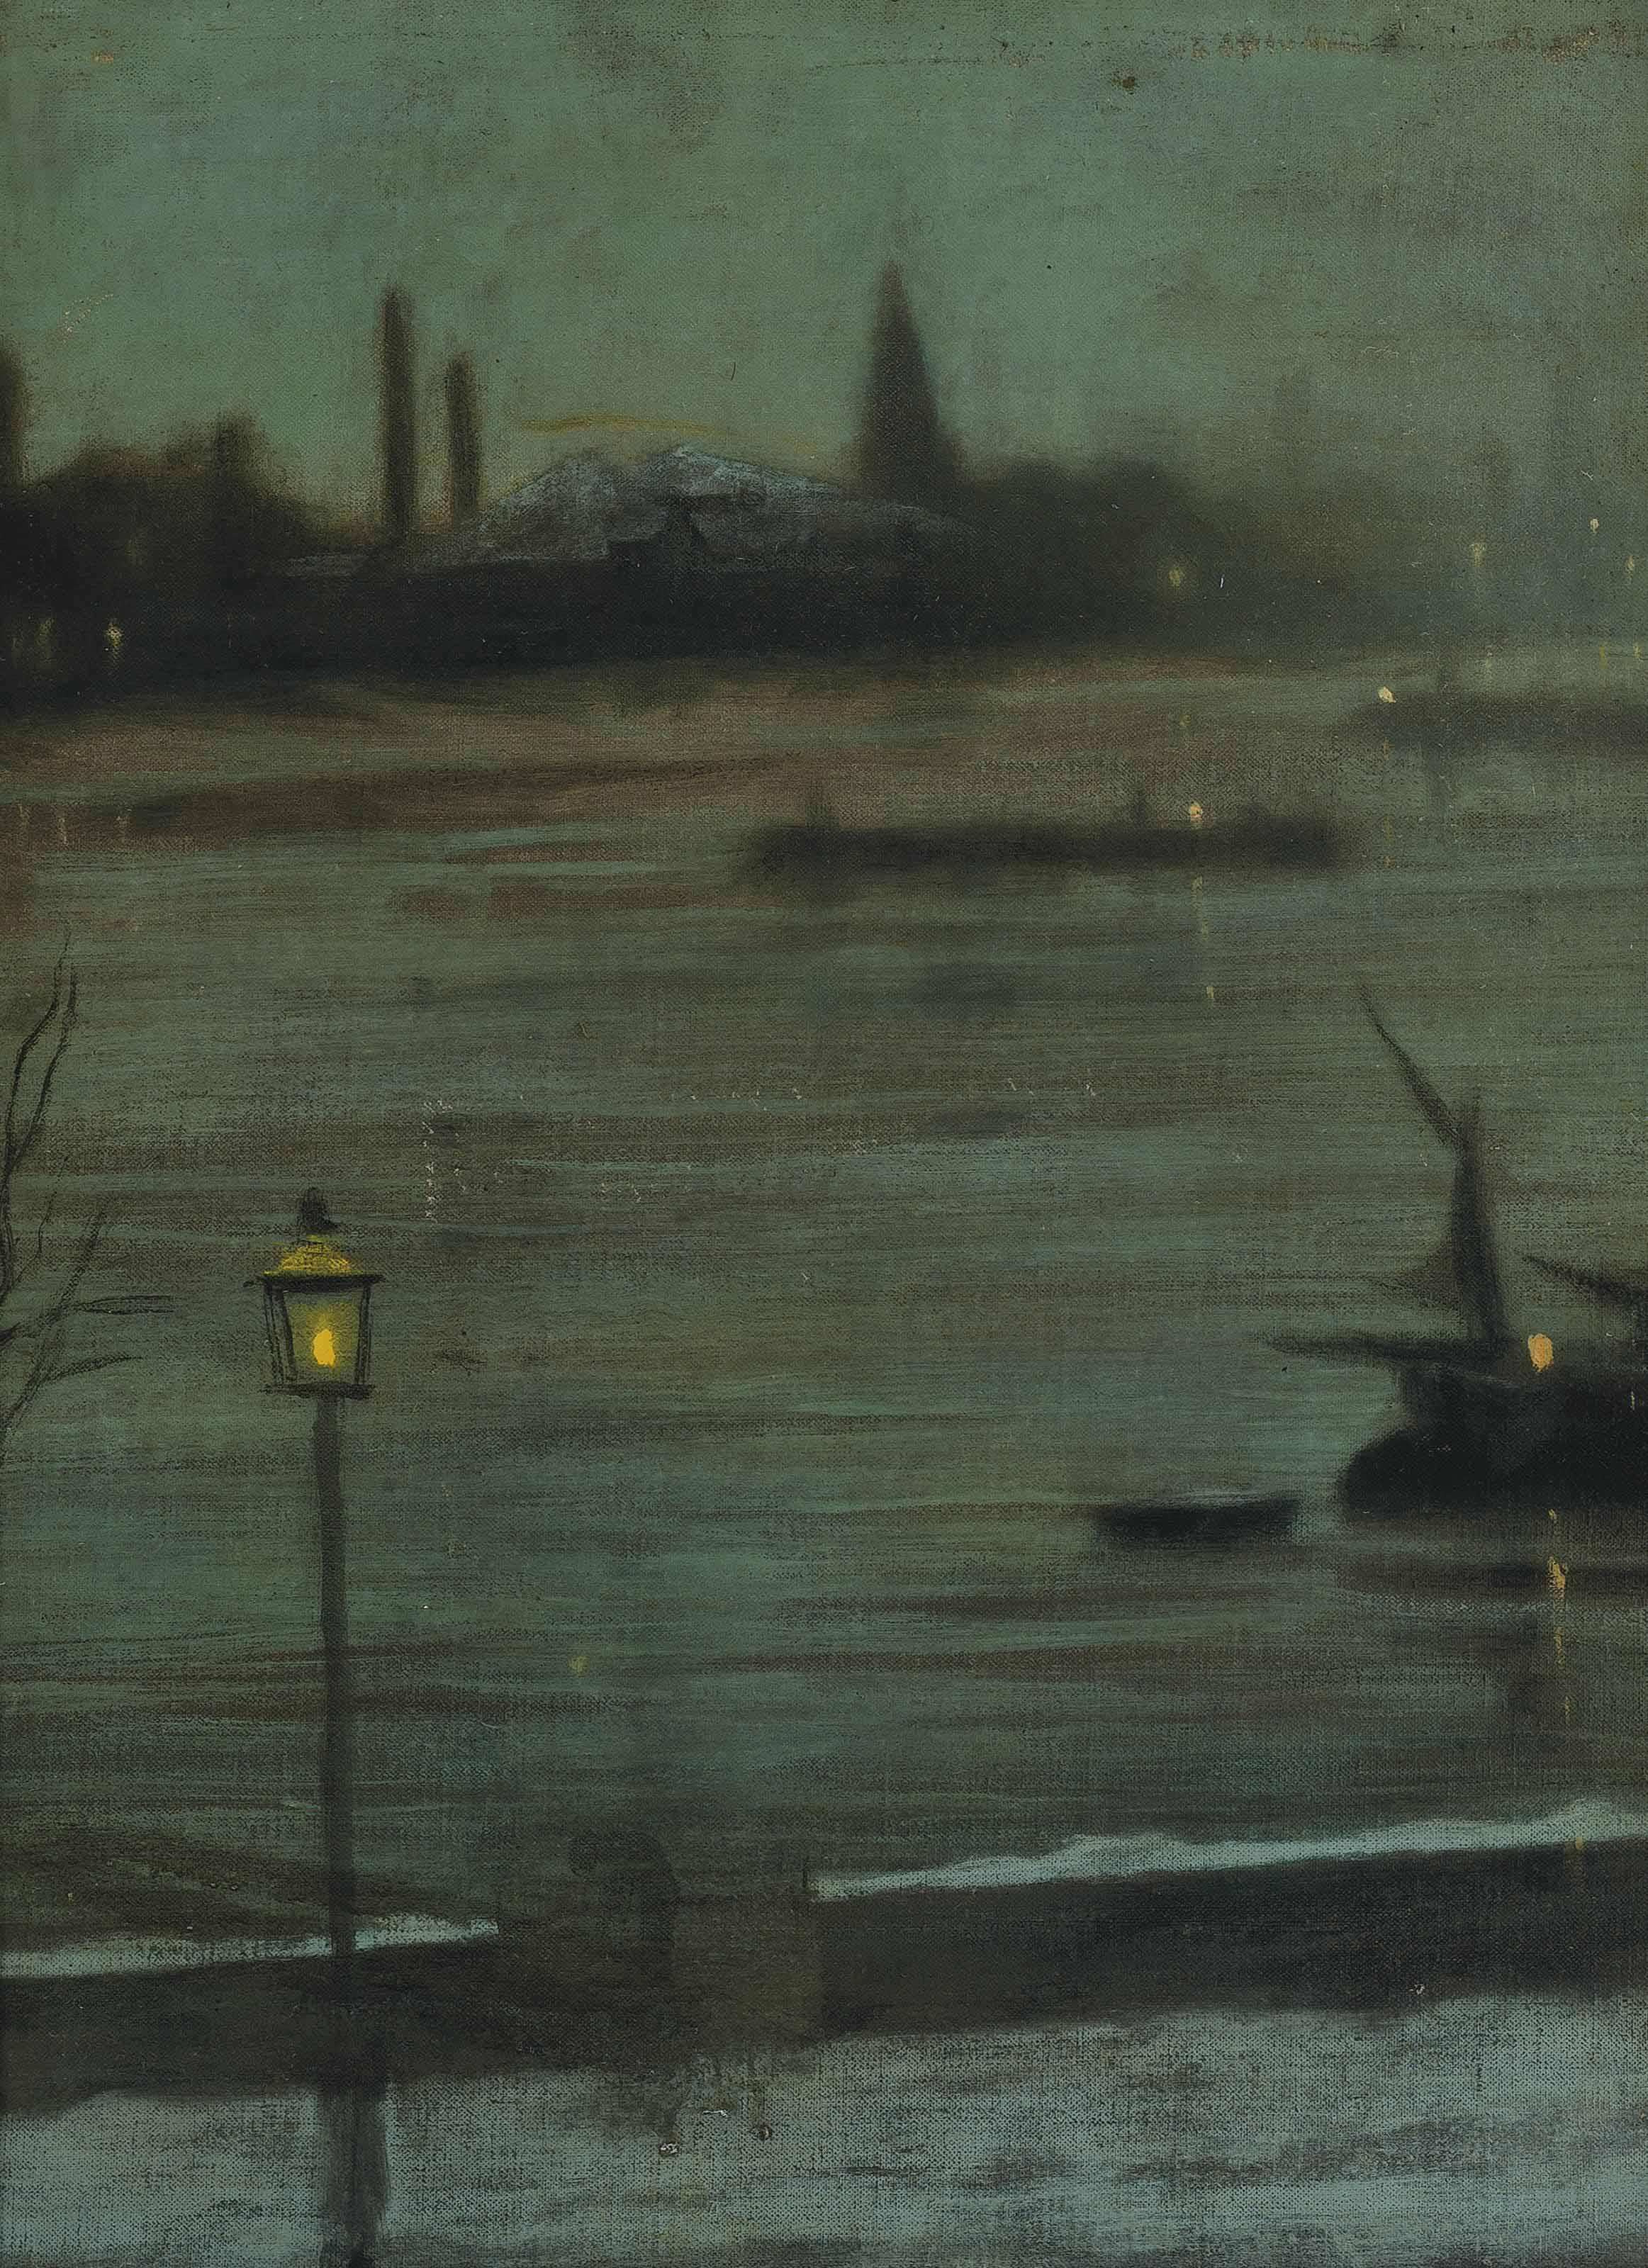 Thames nocturne: Battersea Reach from Cheyne Walk